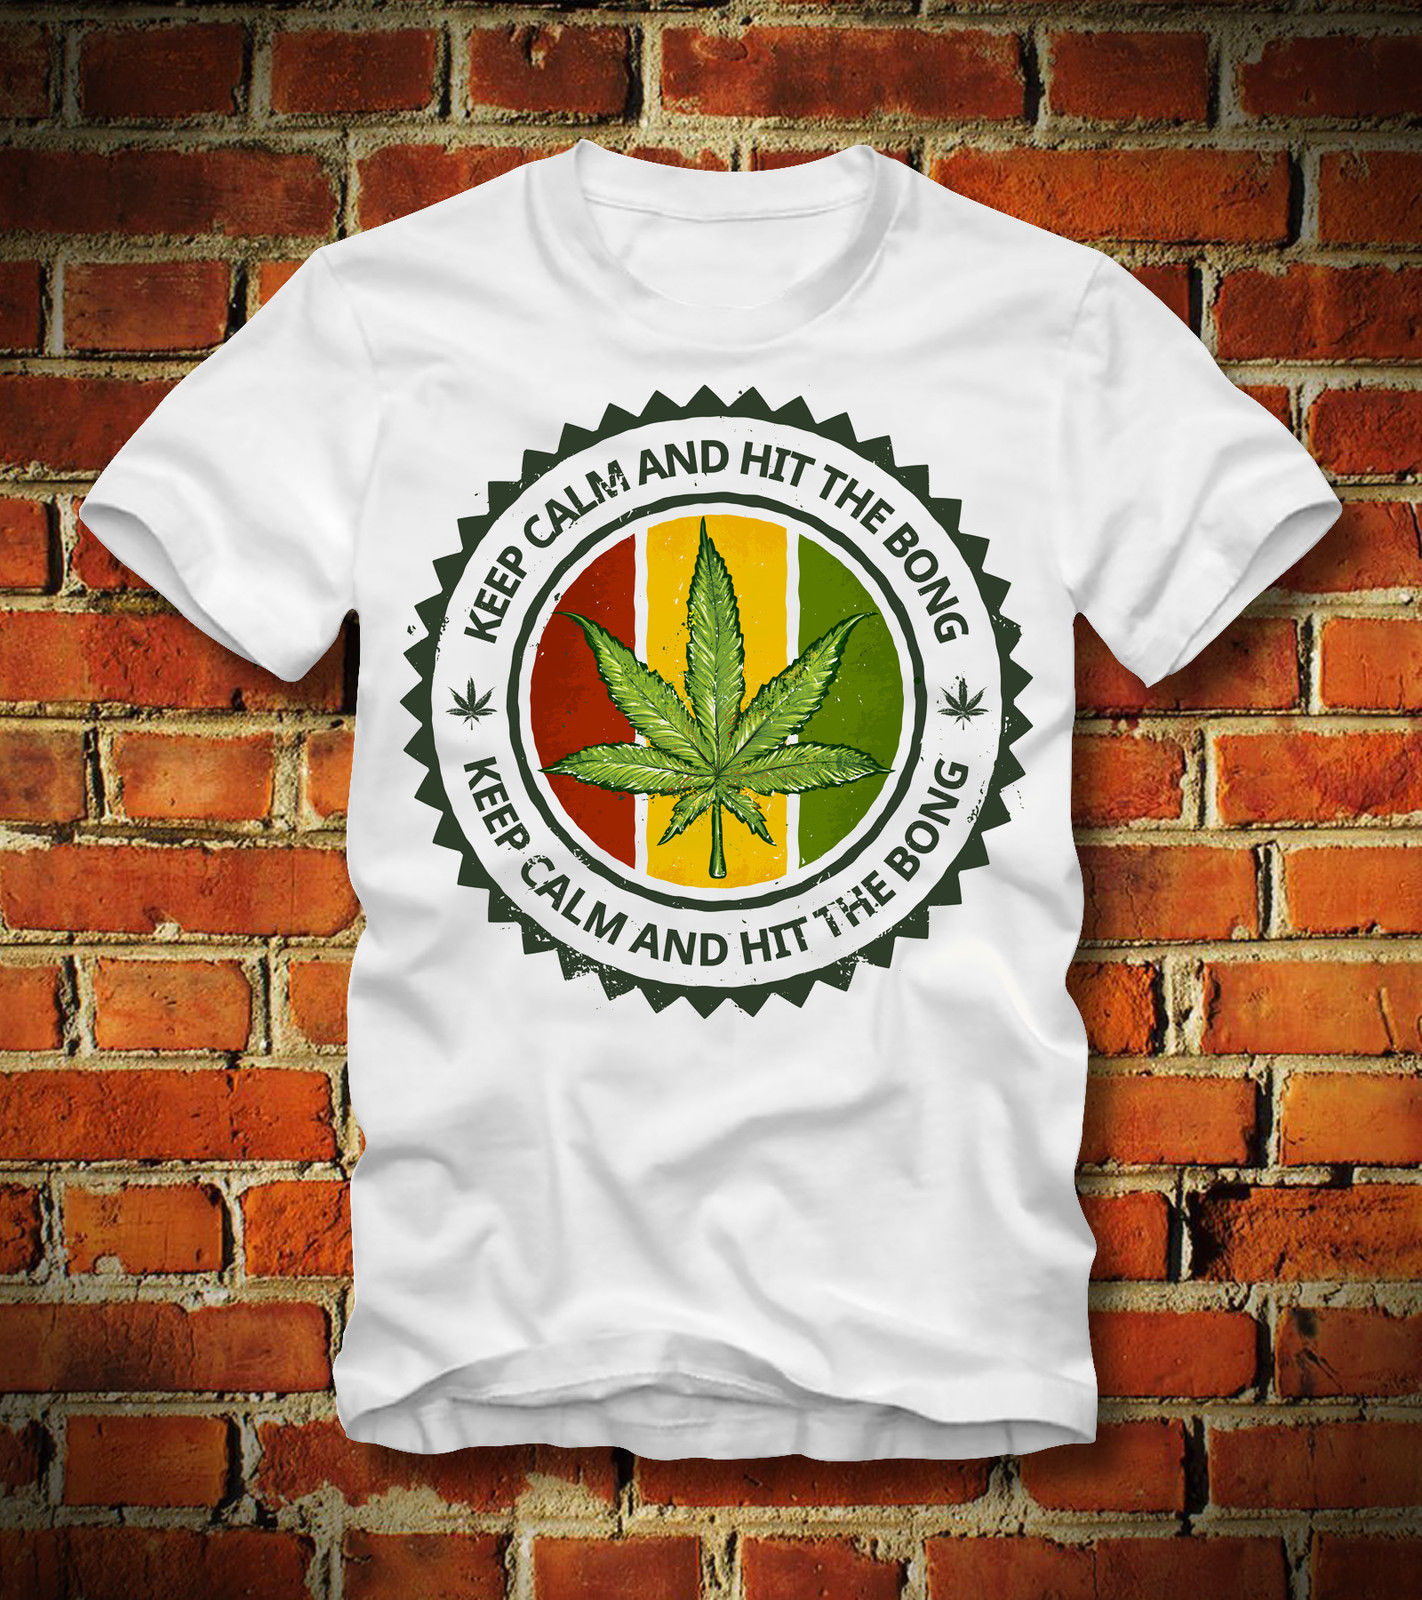 2019 nueva camiseta de verano divertida camiseta KEEP CALM AND HIT THE BONG WEED JOINT POT HI camiseta personalizada